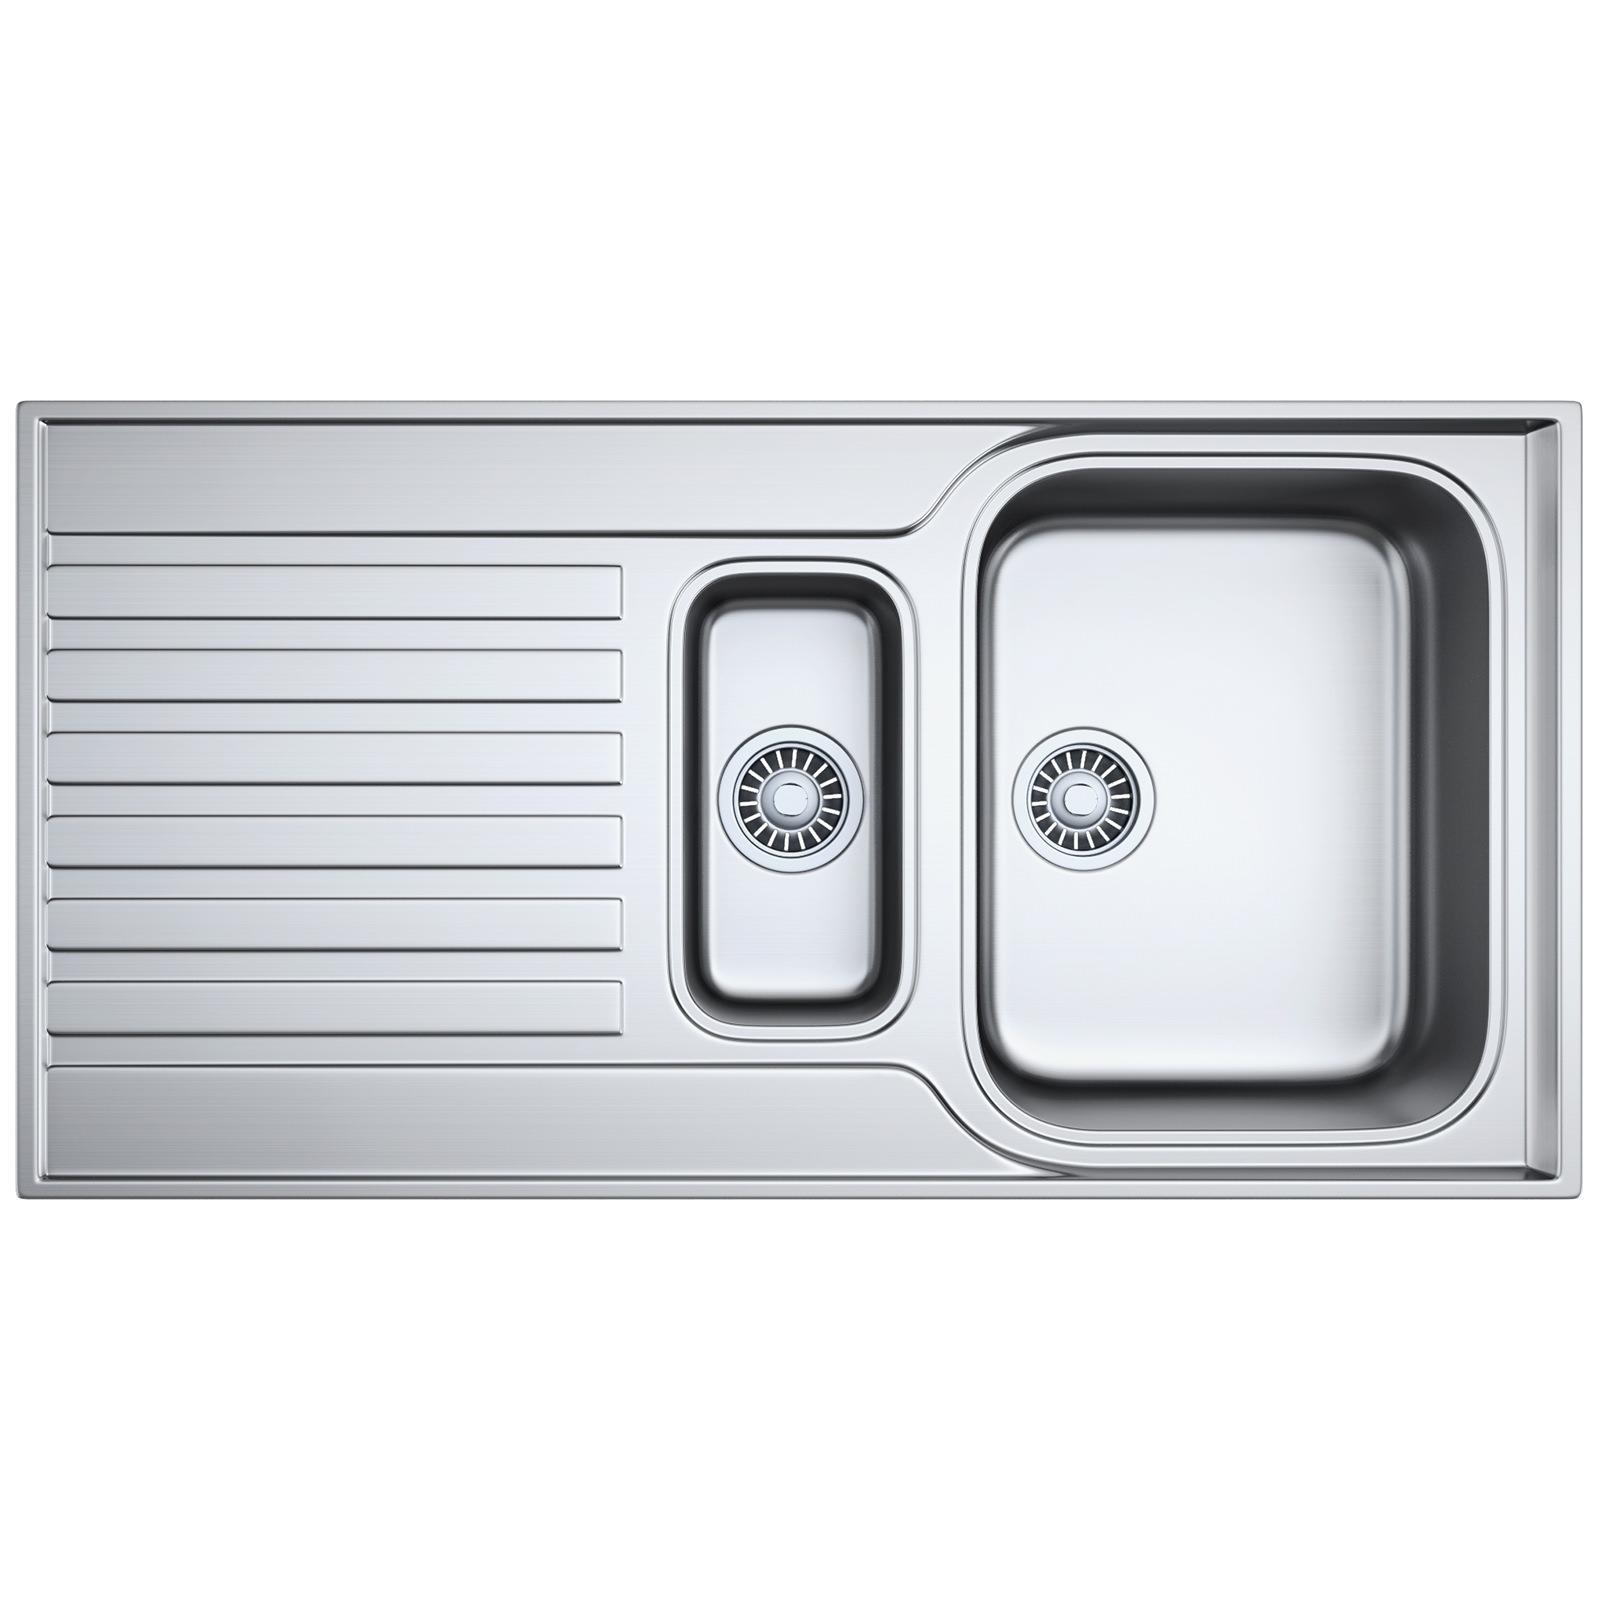 Franke Ascona ASX 651 Stainless Steel 1.5 Bowl Inset Sink | 101.0277.124